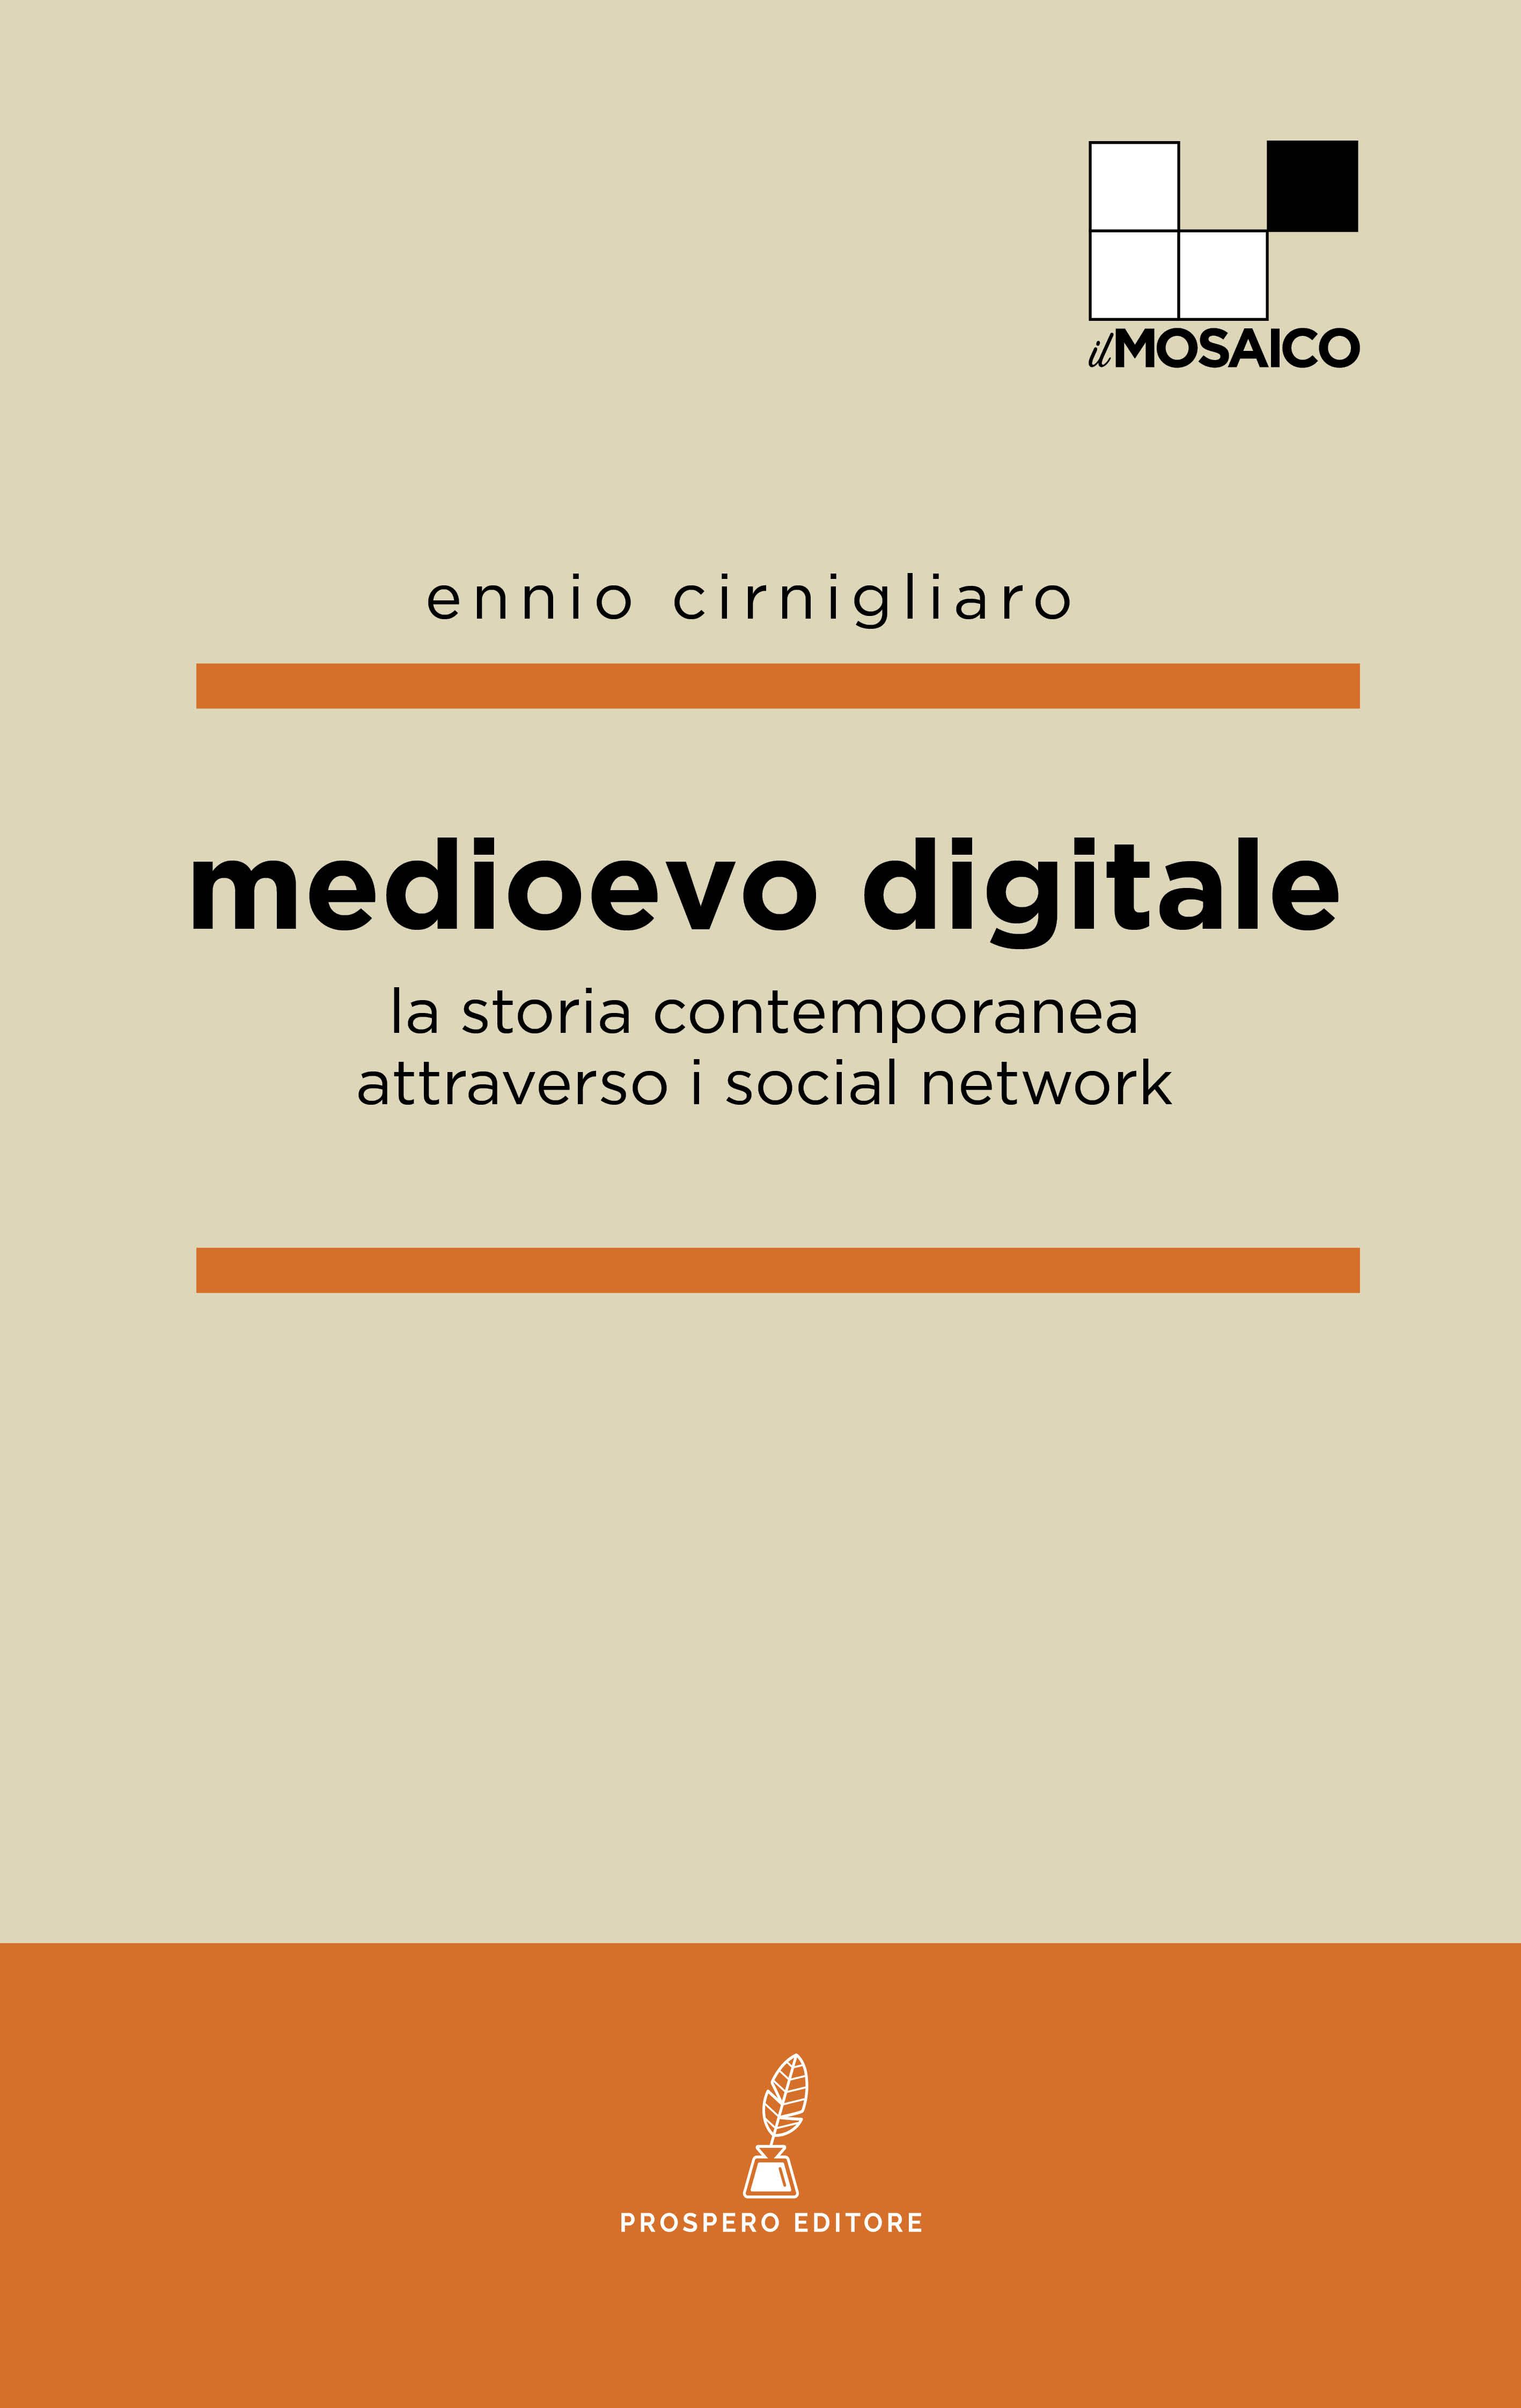 Medioevo digitale-image-1%>